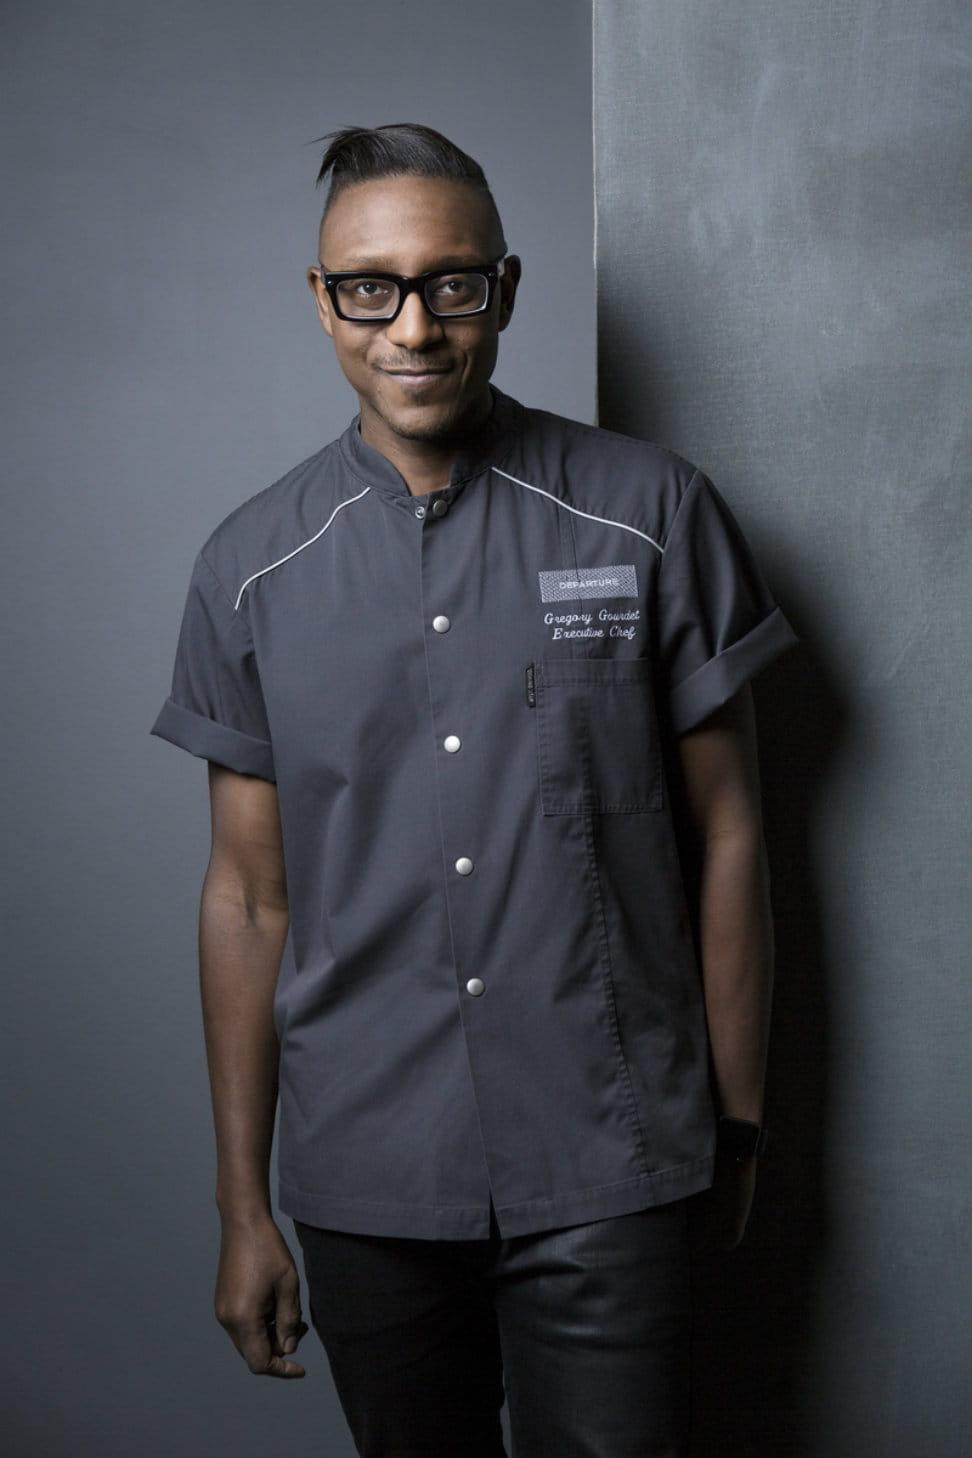 Chef Gregory Gourdet